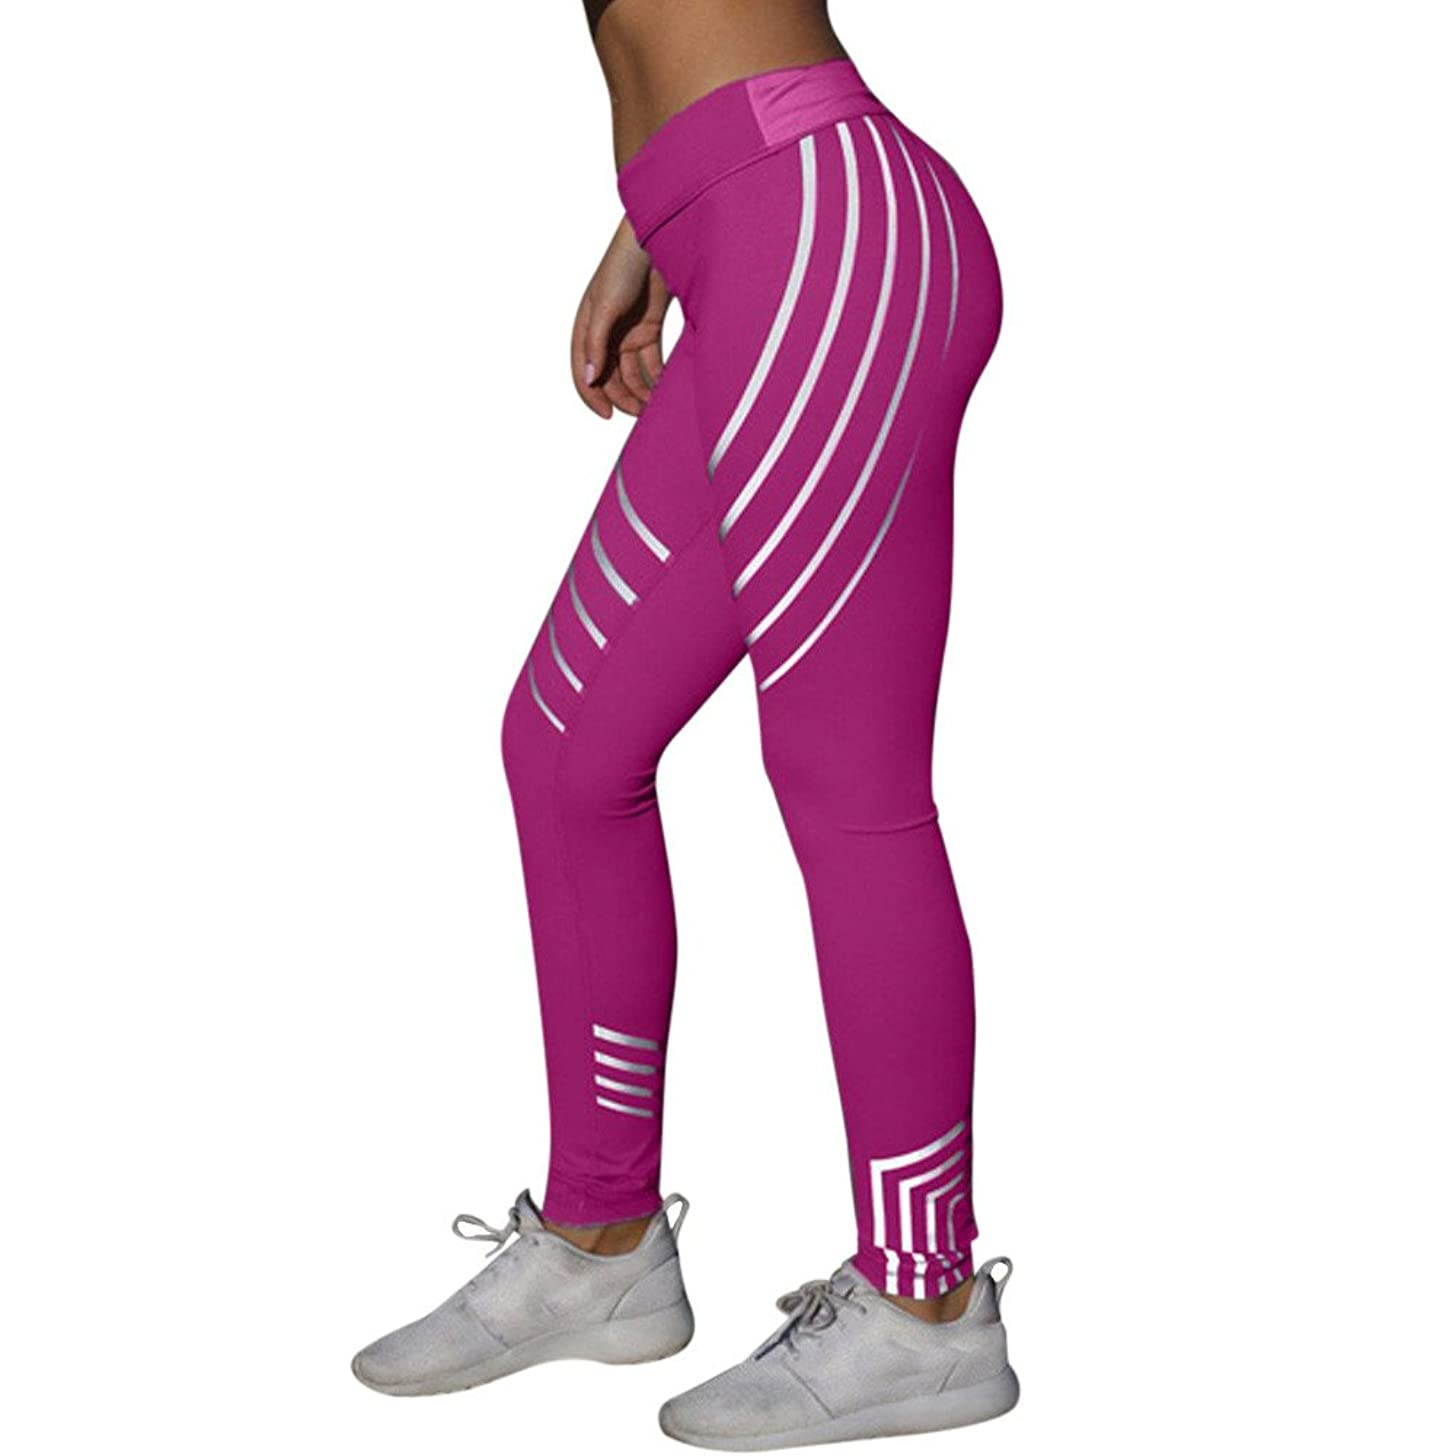 Yoga Pants for Women Capri Gibobby Womens Tummy Control High Waisted Yoga Leggings Slimming Workout Running Trousers